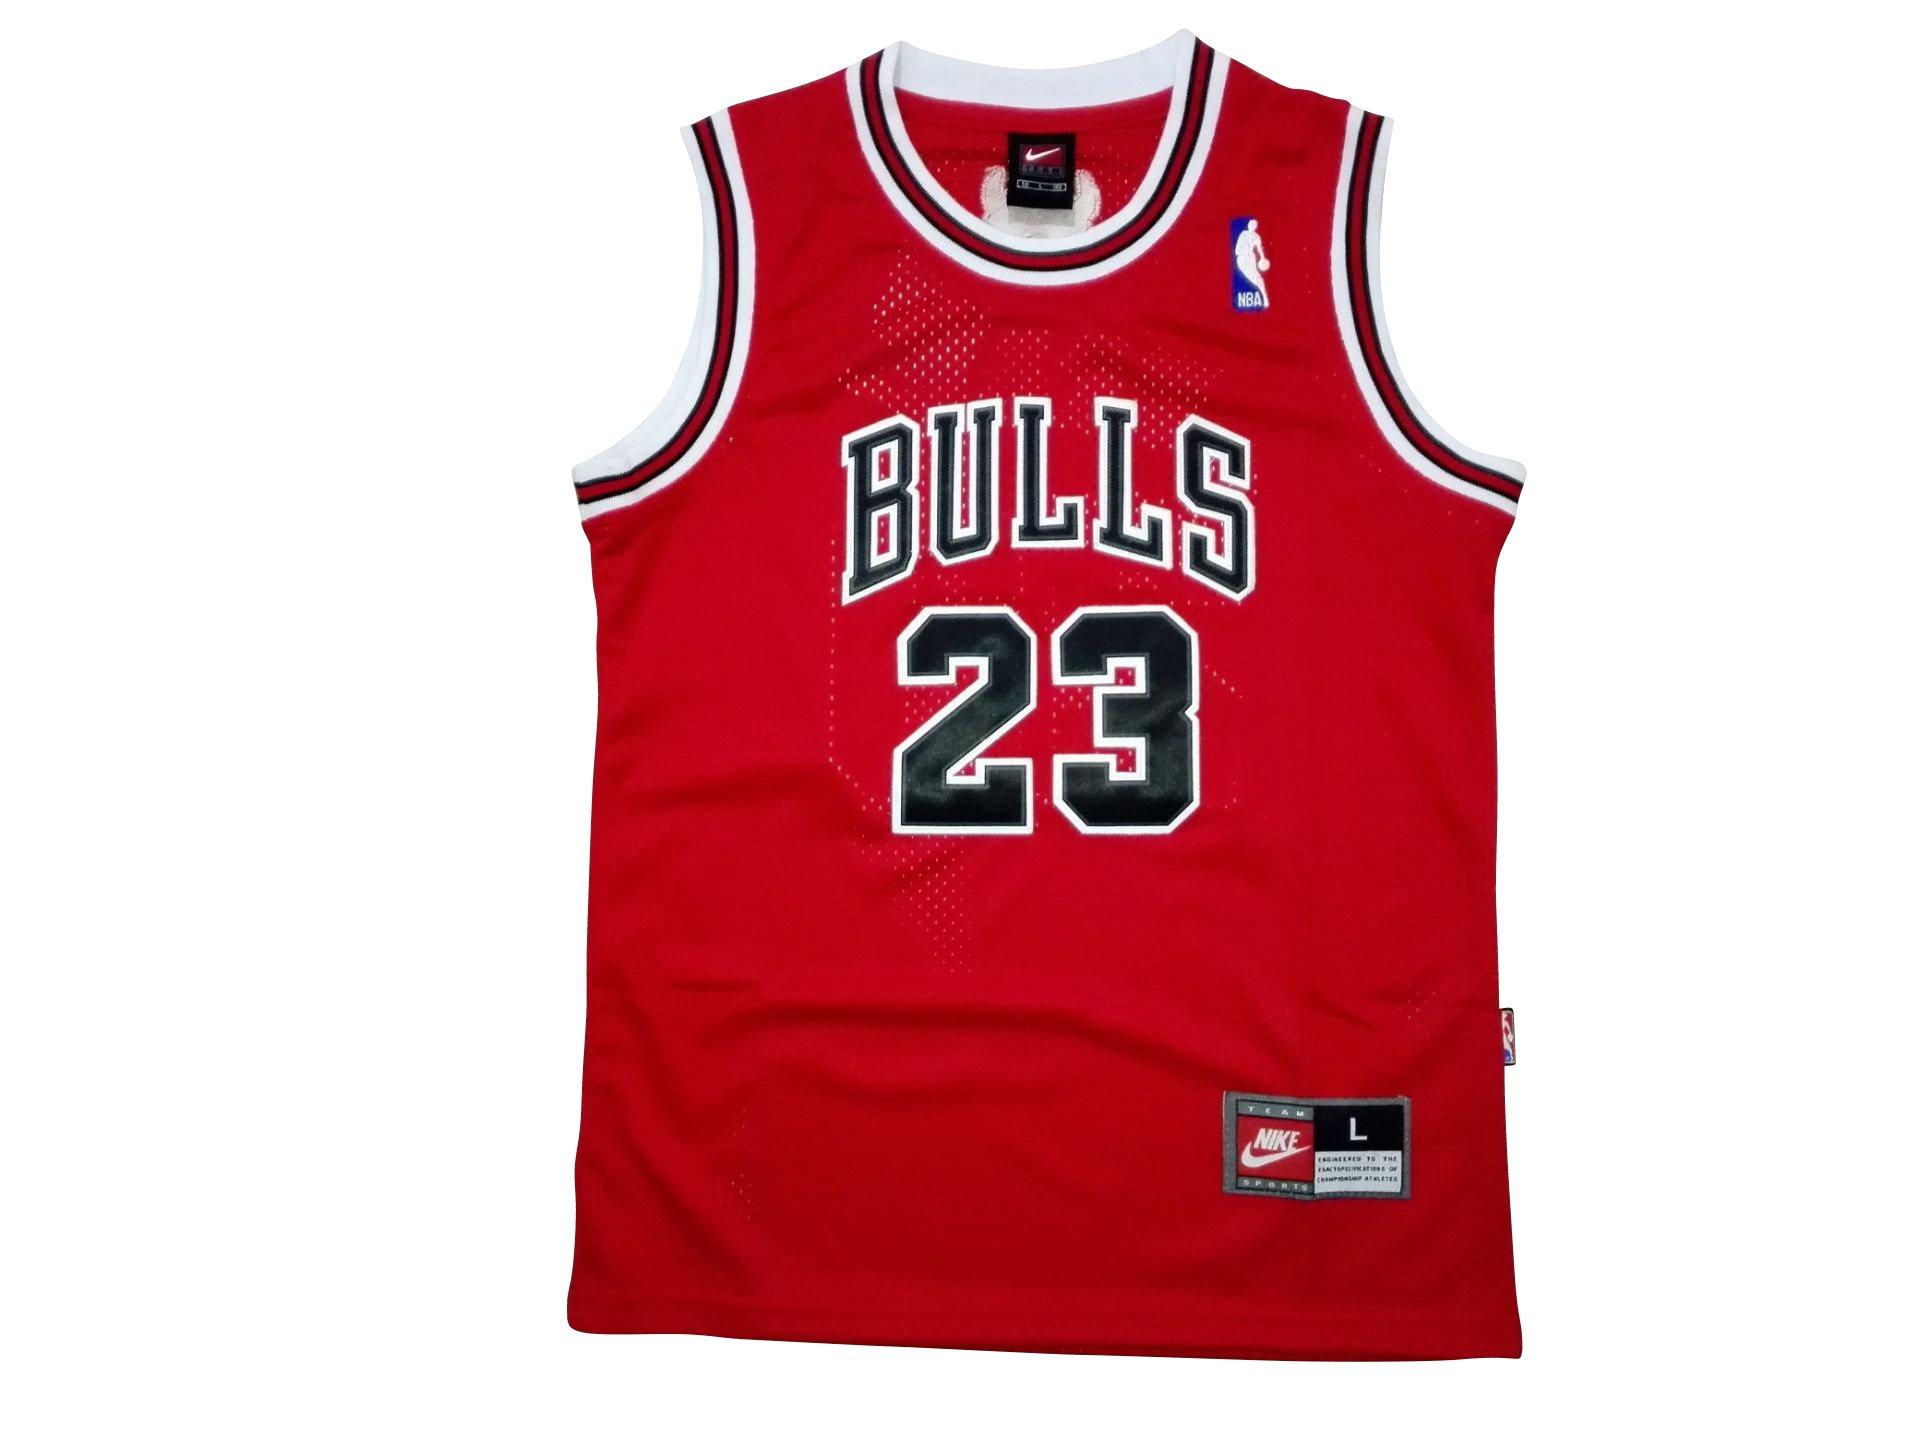 fc43d68129b259 Galleon -  23 Michael Jordan YOUTH Basketball Jersey + Get Mr. Sport Box As  A GIFT (Red